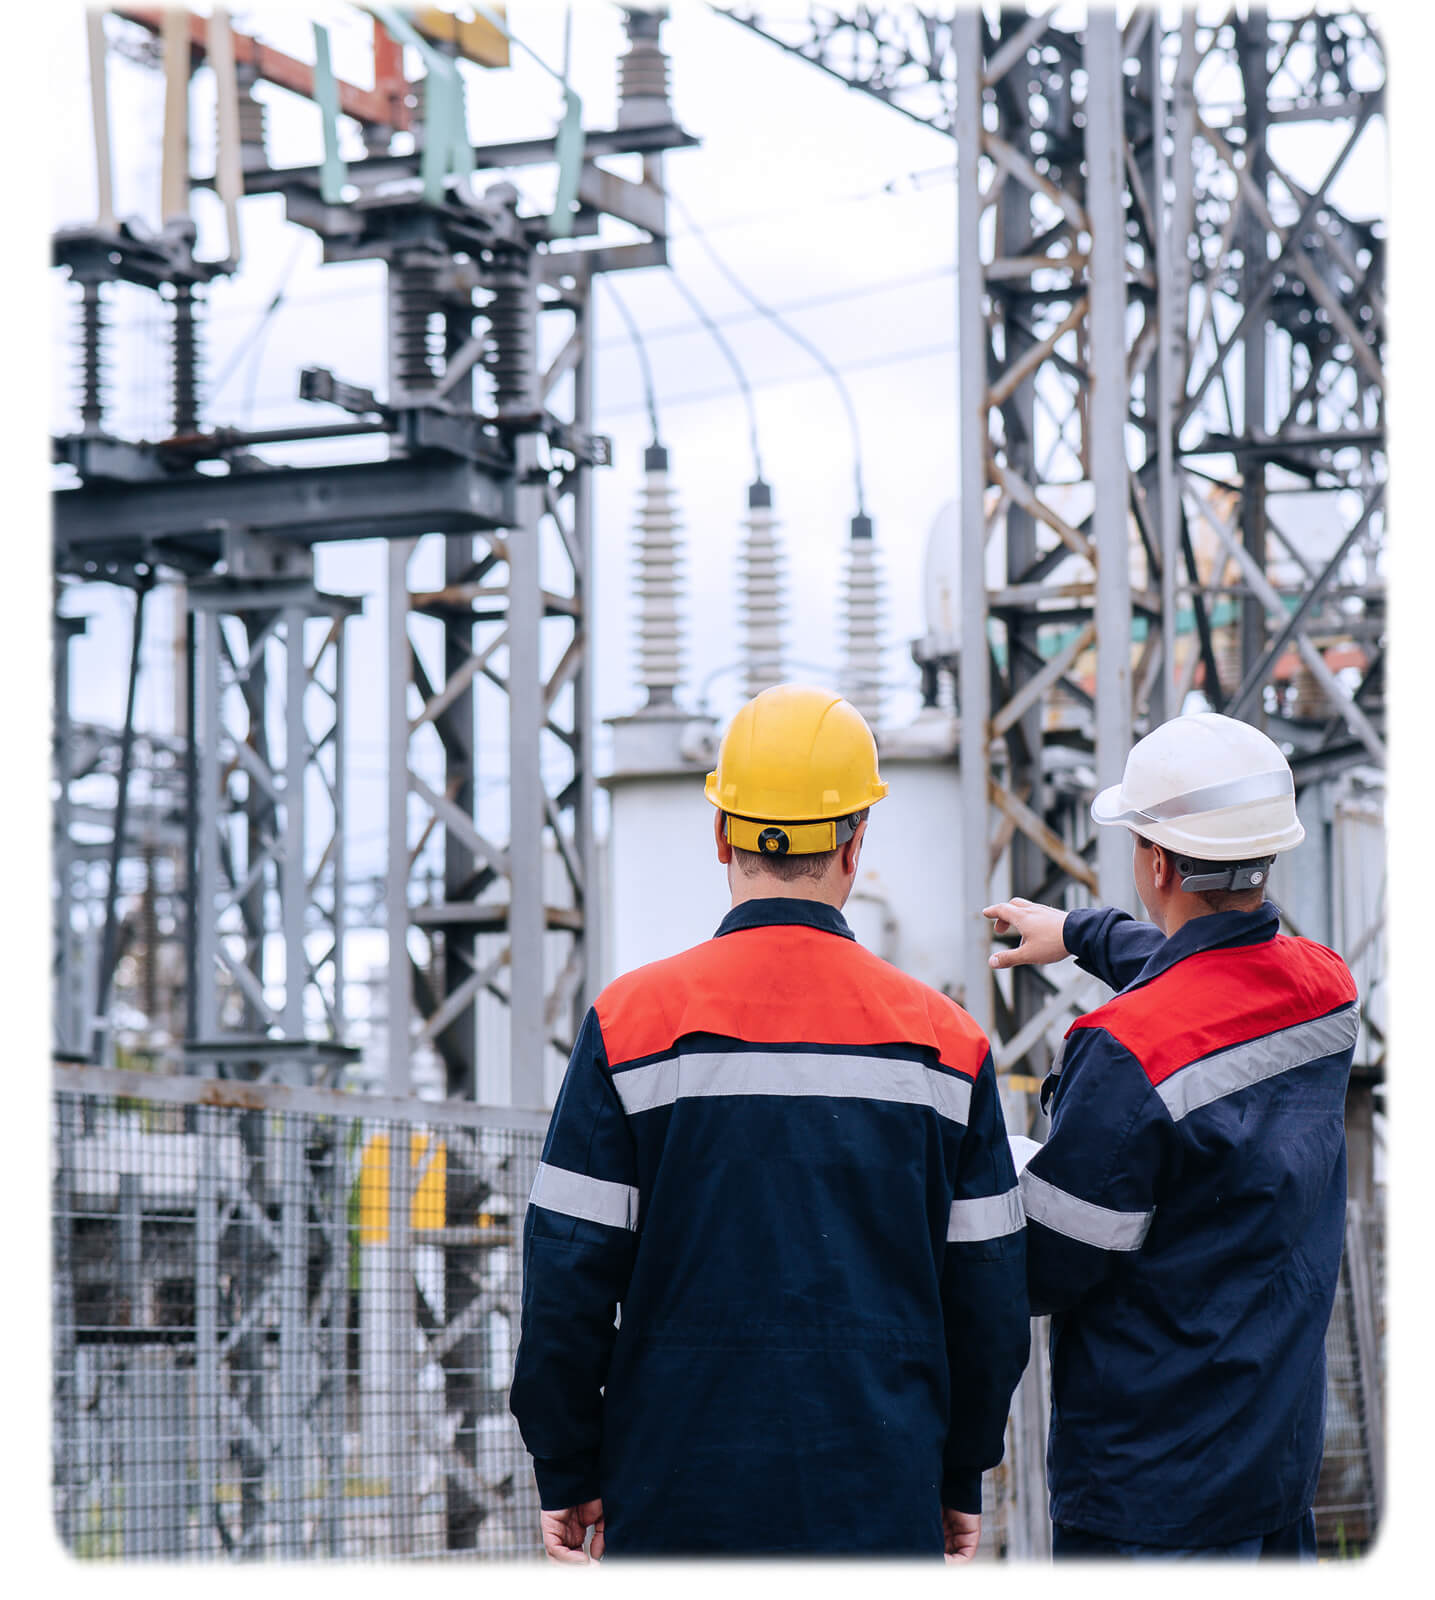 fleetPro_B2B_energieversorger_Einsatzplanung